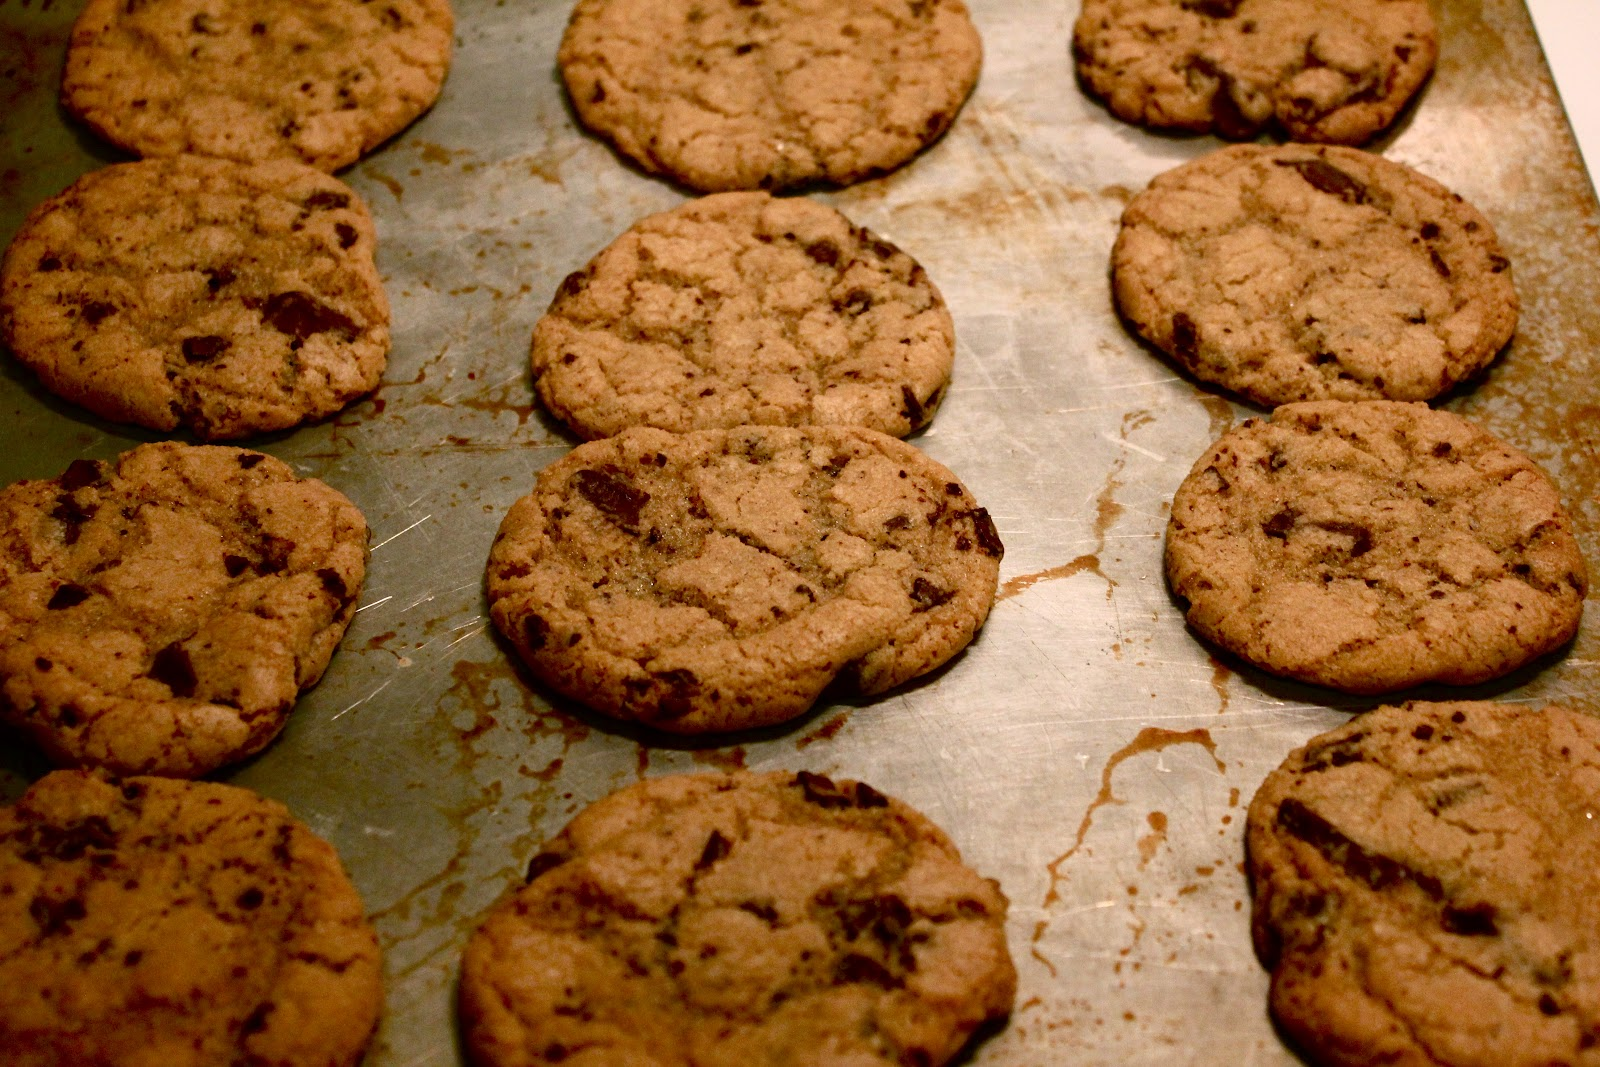 Cook, the Namesake: Sea Salt and Dark Chocolate Chip Cookies